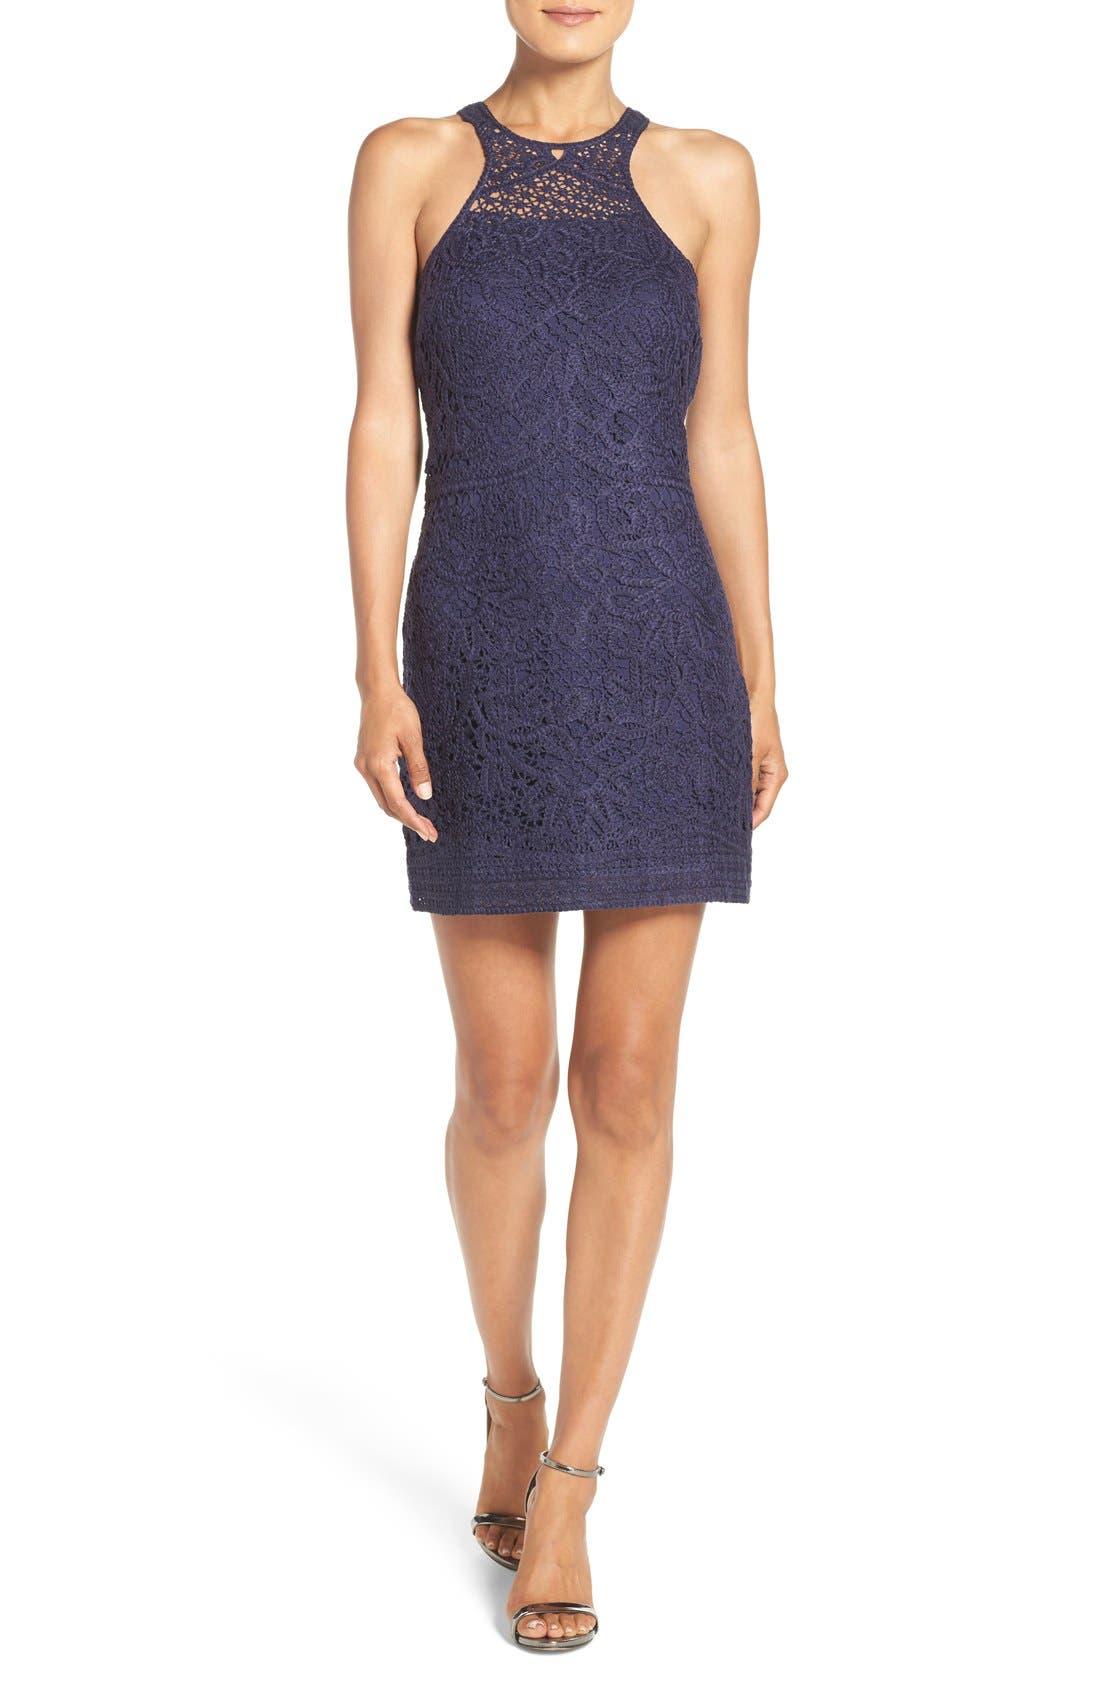 Alternate Image 1 Selected - Lilly Pulitzer® 'Jaimie' Crochet Shift Dress